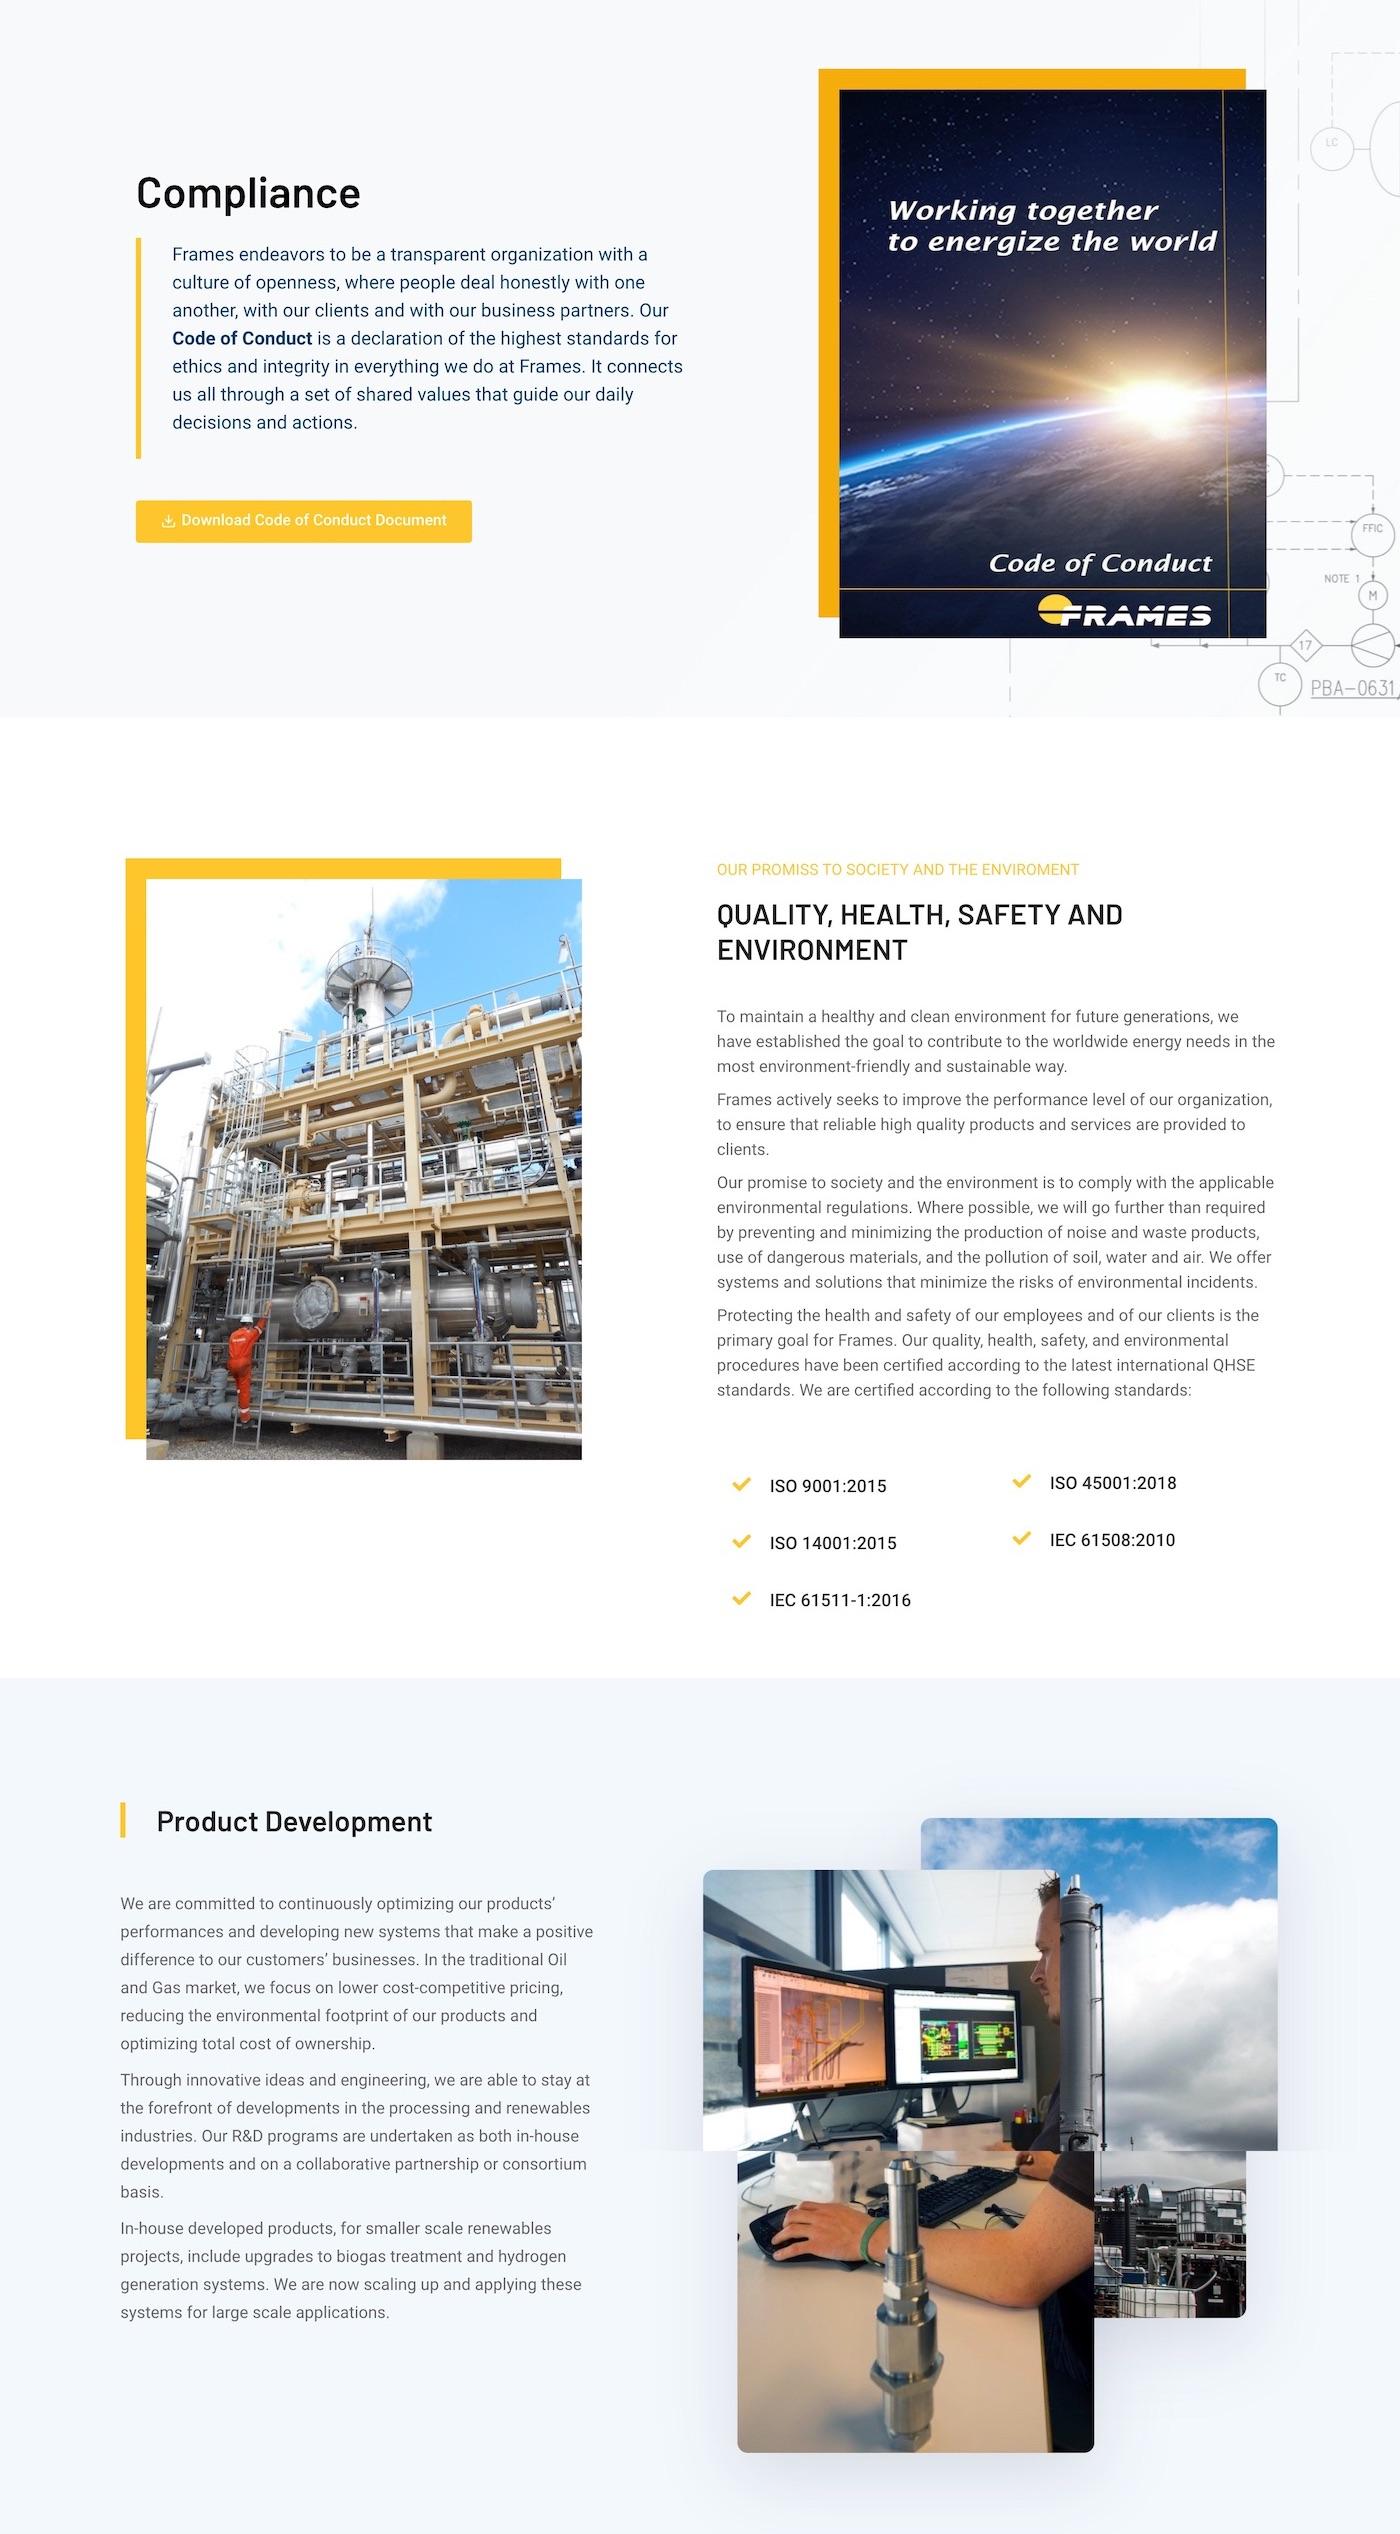 frames-group.com-corporate-wordpress-website-development-work-in-netherland-europe-about-2